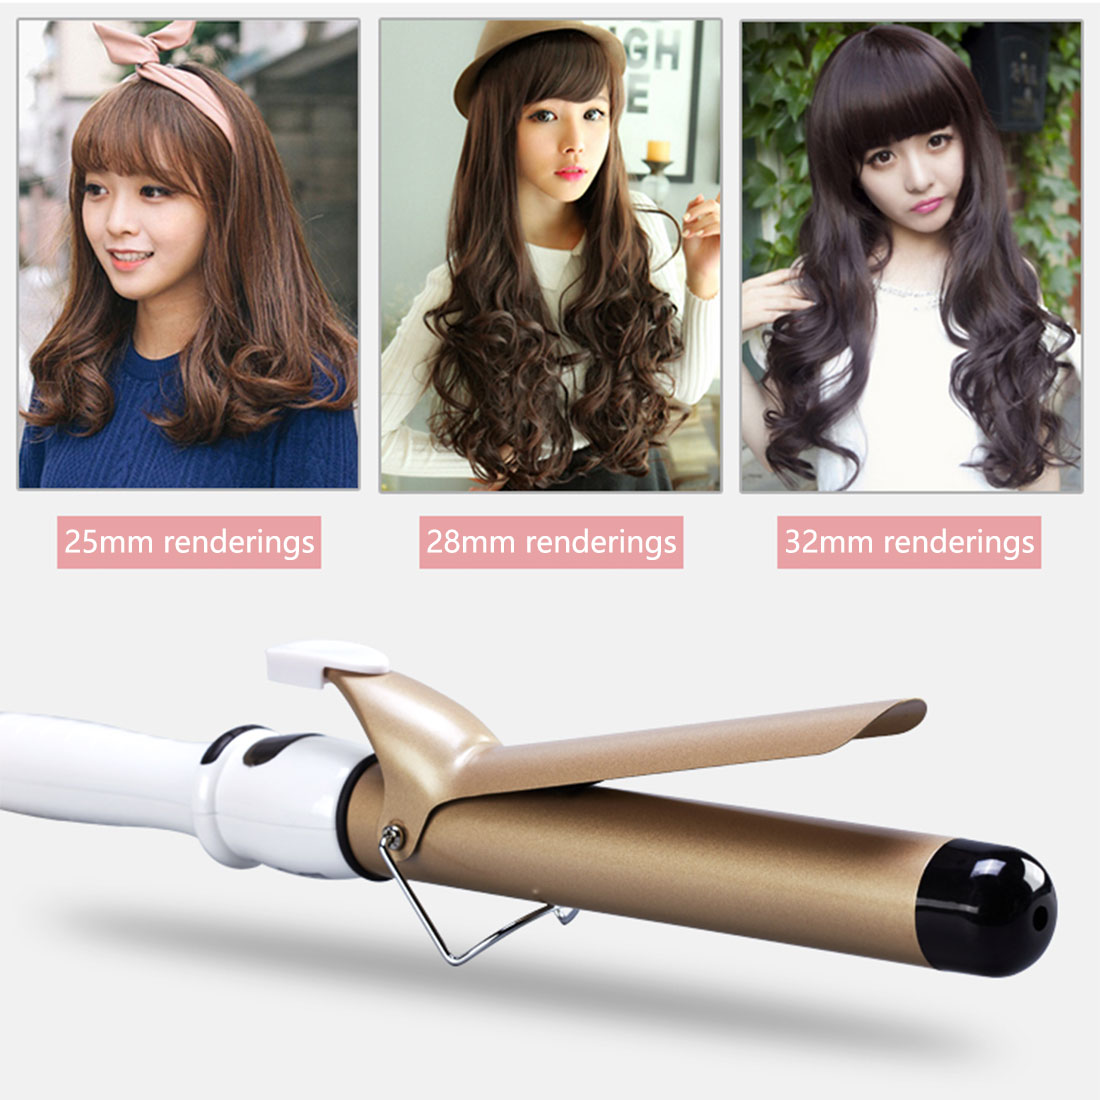 ferro 19-38mm wand vacilar moda estilo de cabelo